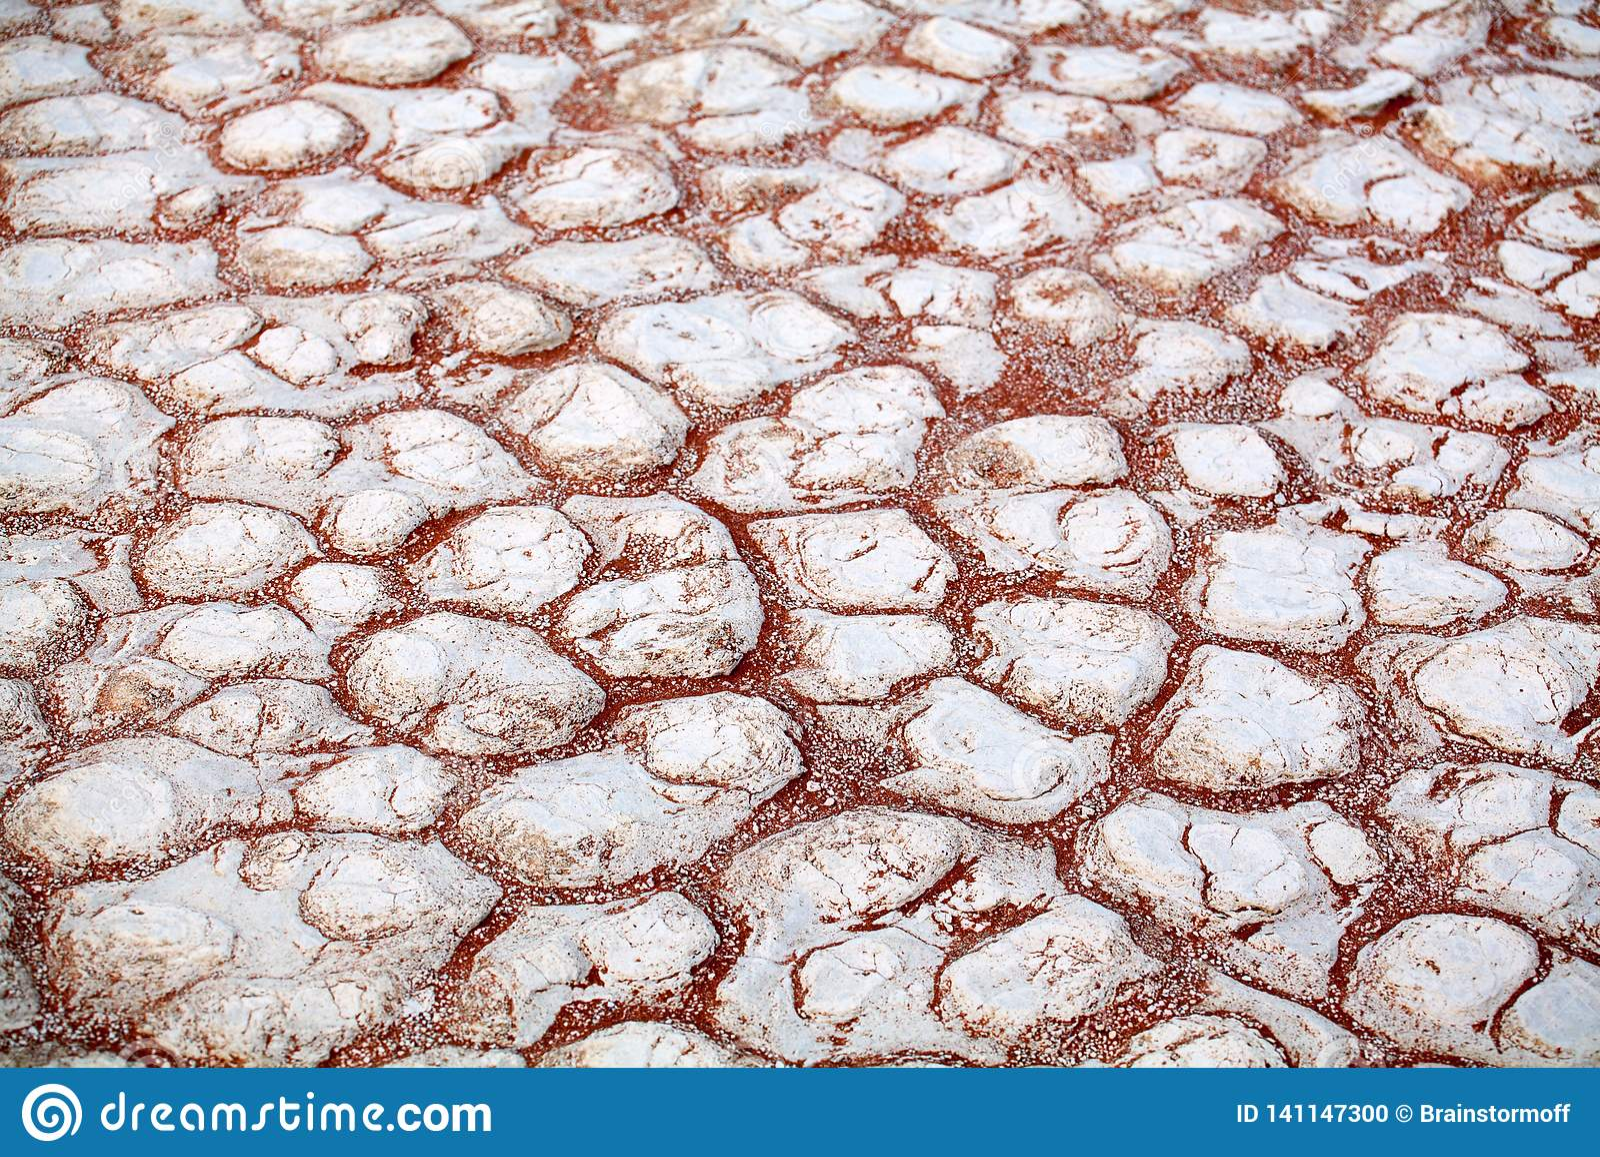 Cracked white dry clay surface on orange sand background in Etosha salt pan Namib desert top view closeup